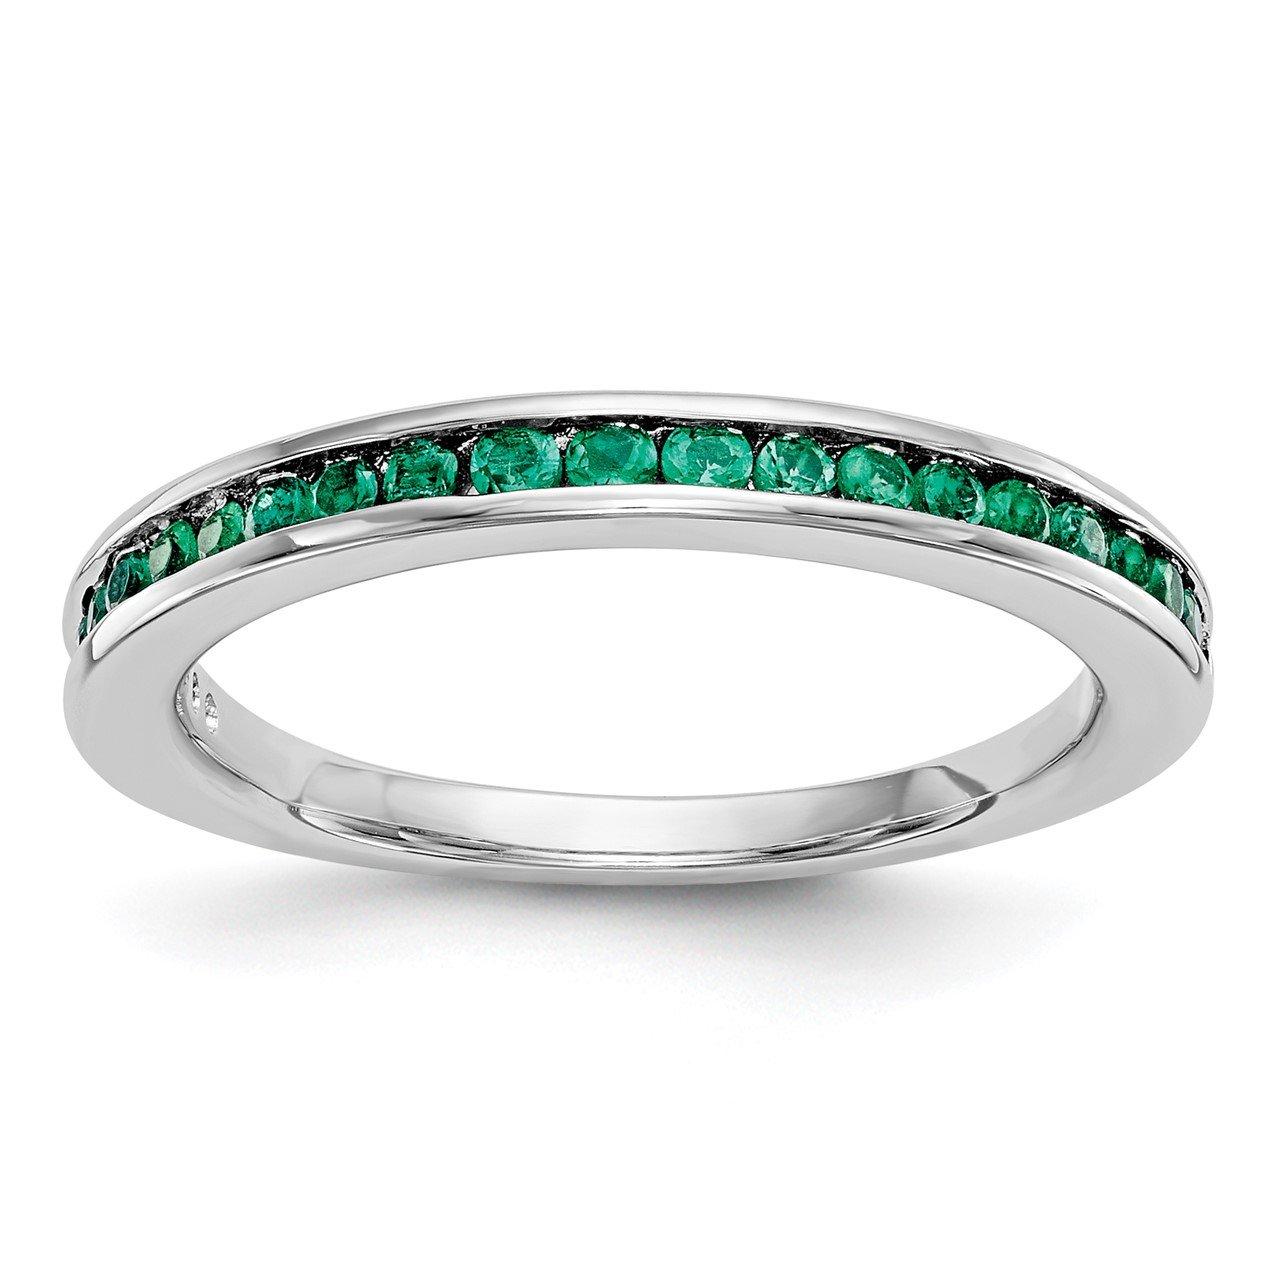 14k White Gold Emerald Band